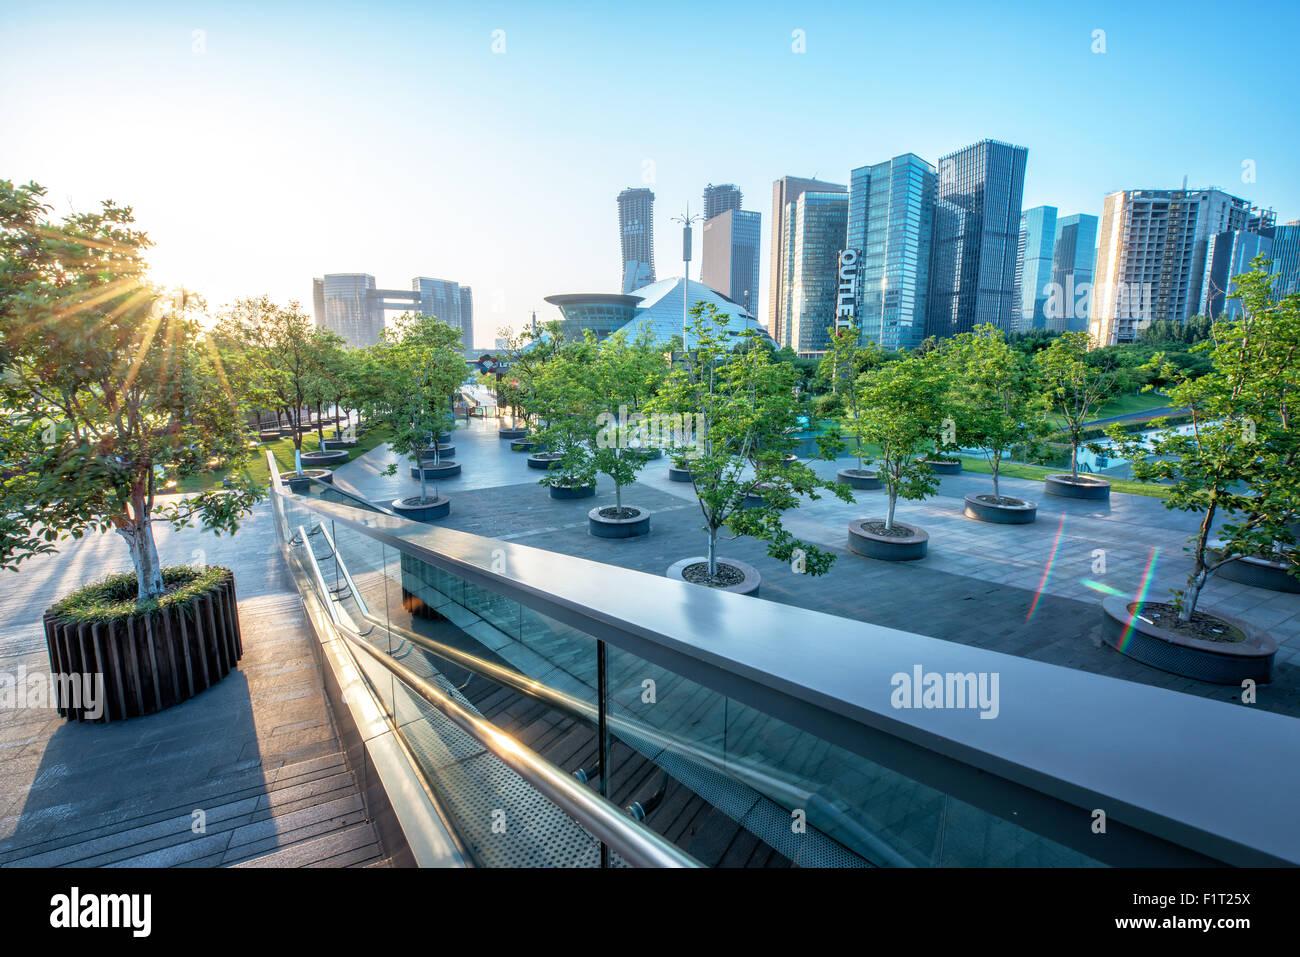 Giungla Urbana, moderno Hangzhou Jianggan cityscape su una bella giornata, Hangzhou, Zhejiang, Cina e Asia Immagini Stock